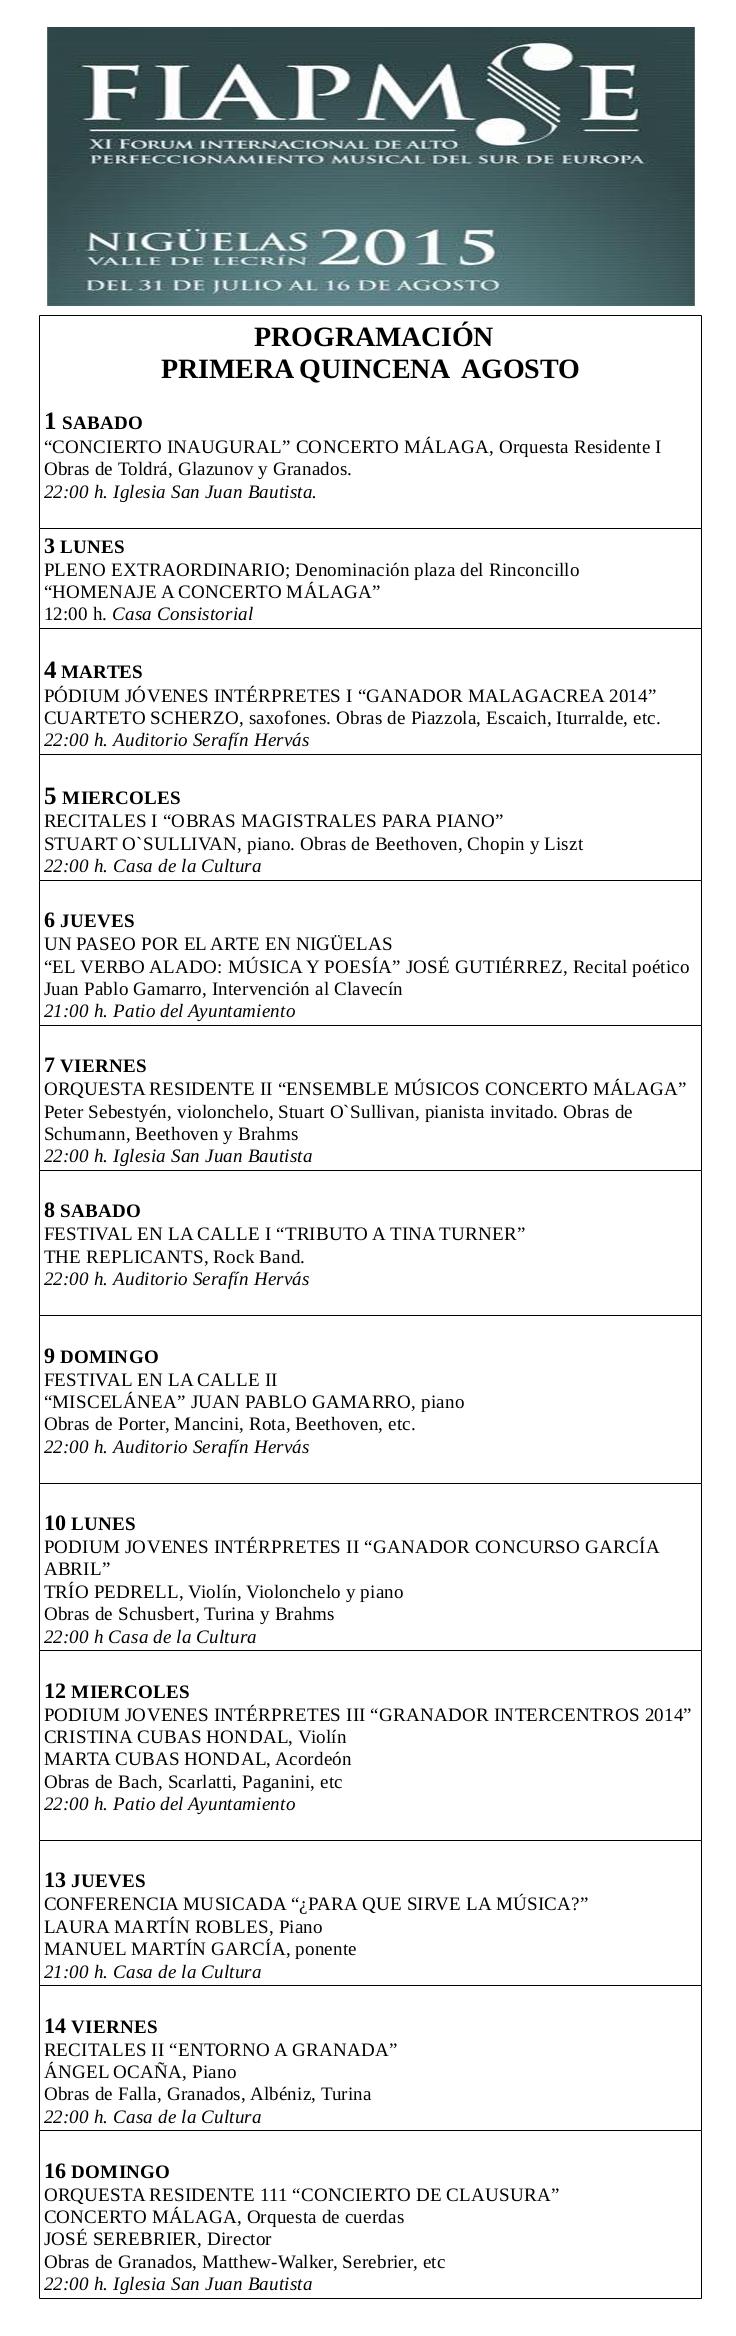 fiampse programa 2015